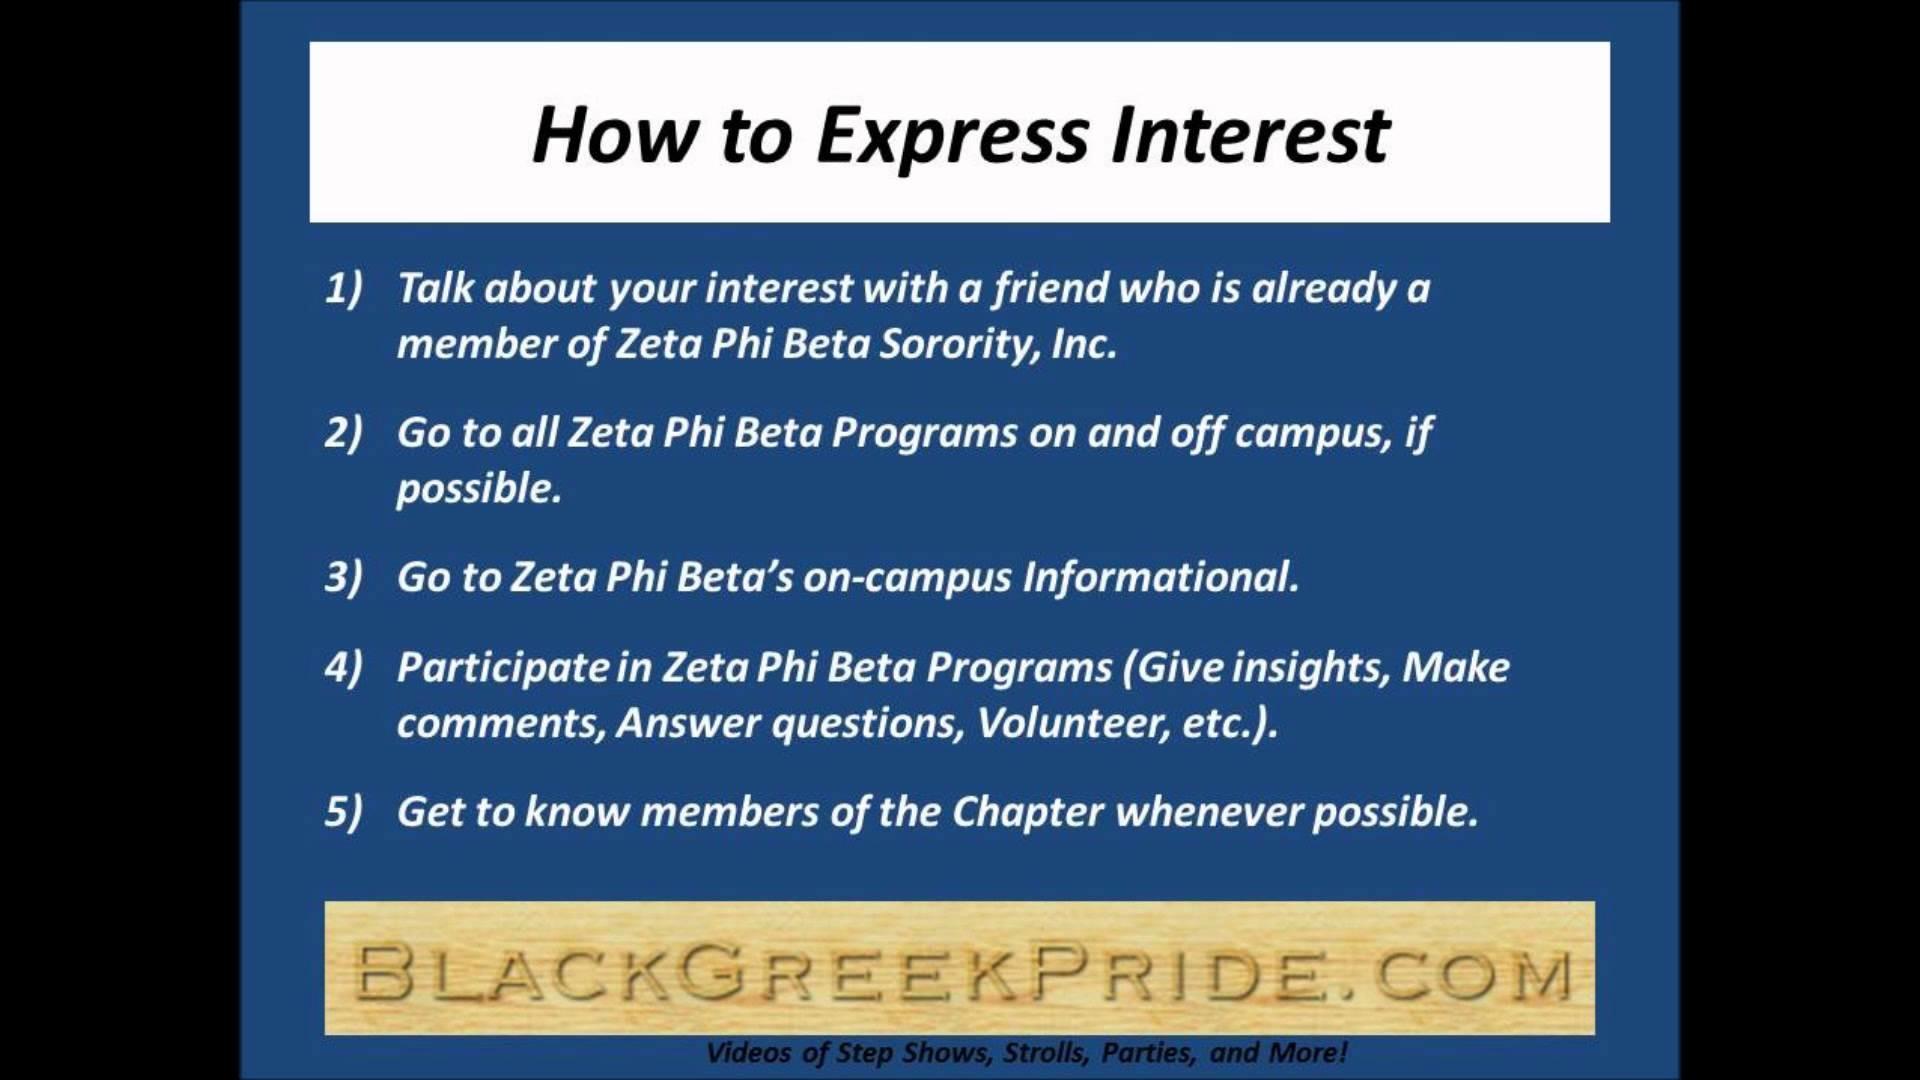 How to Express Interest in Zeta Phi Beta